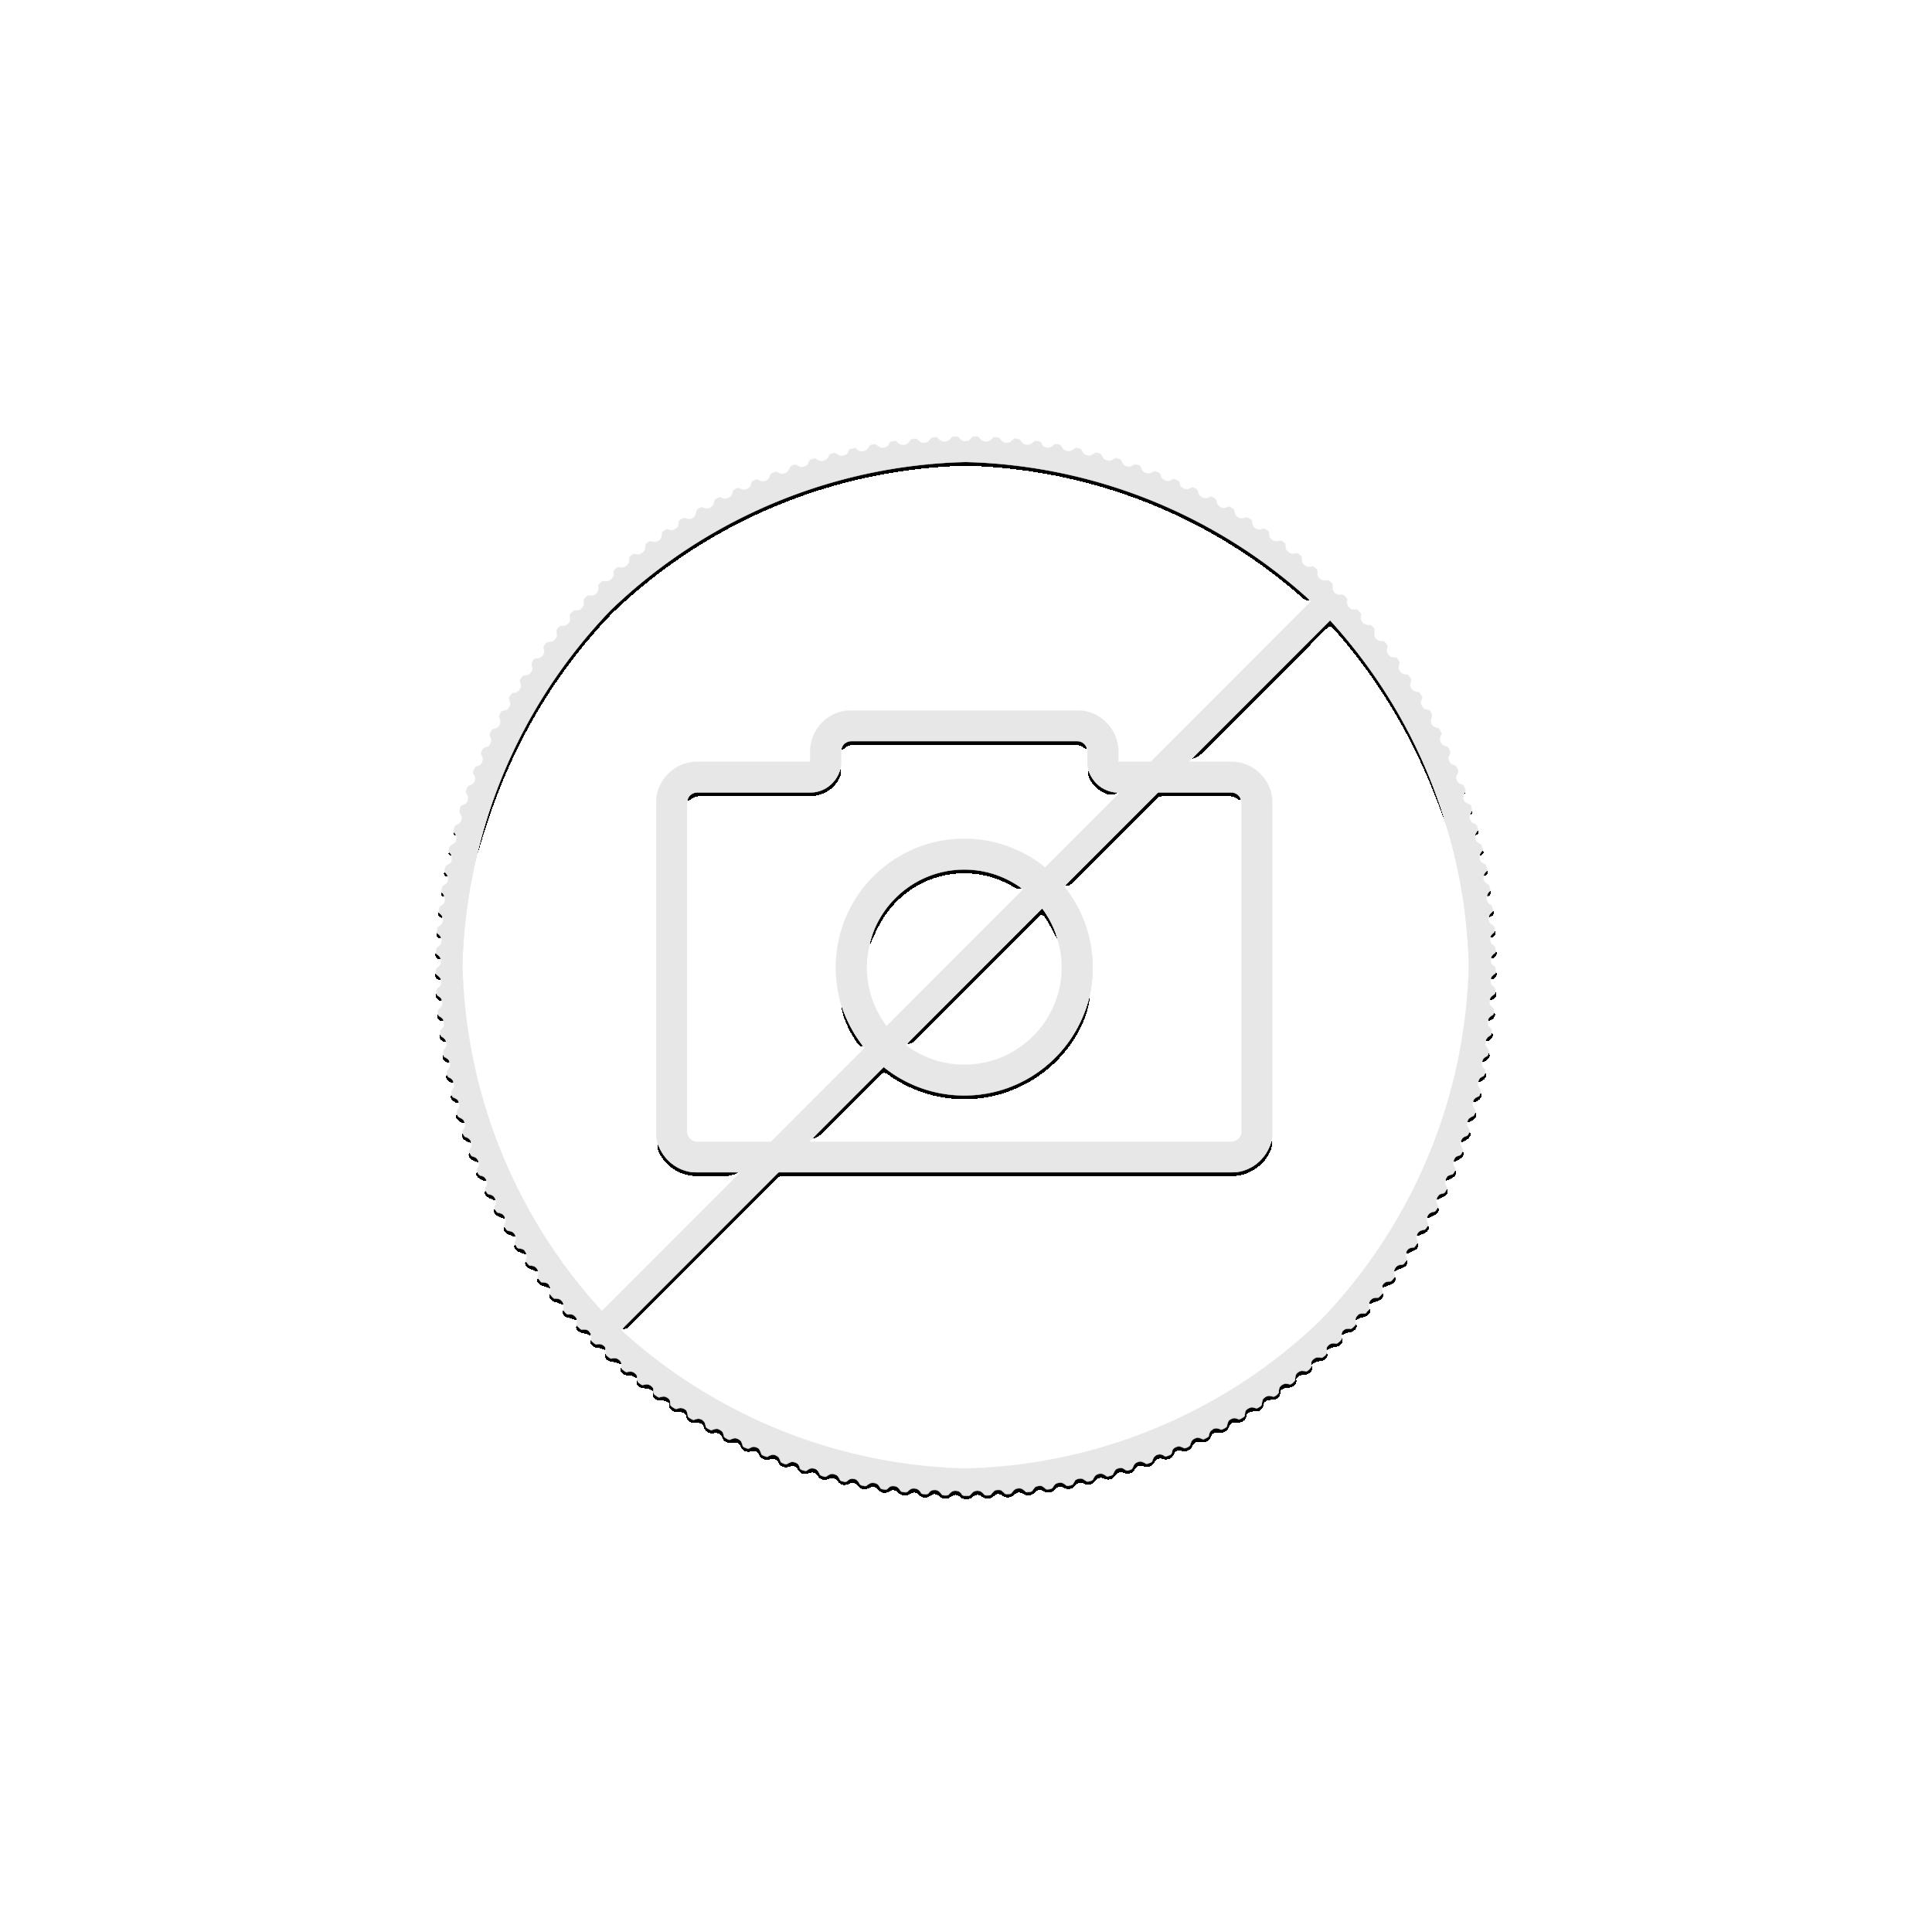 1 troy ounce gouden munt Emoe 2020